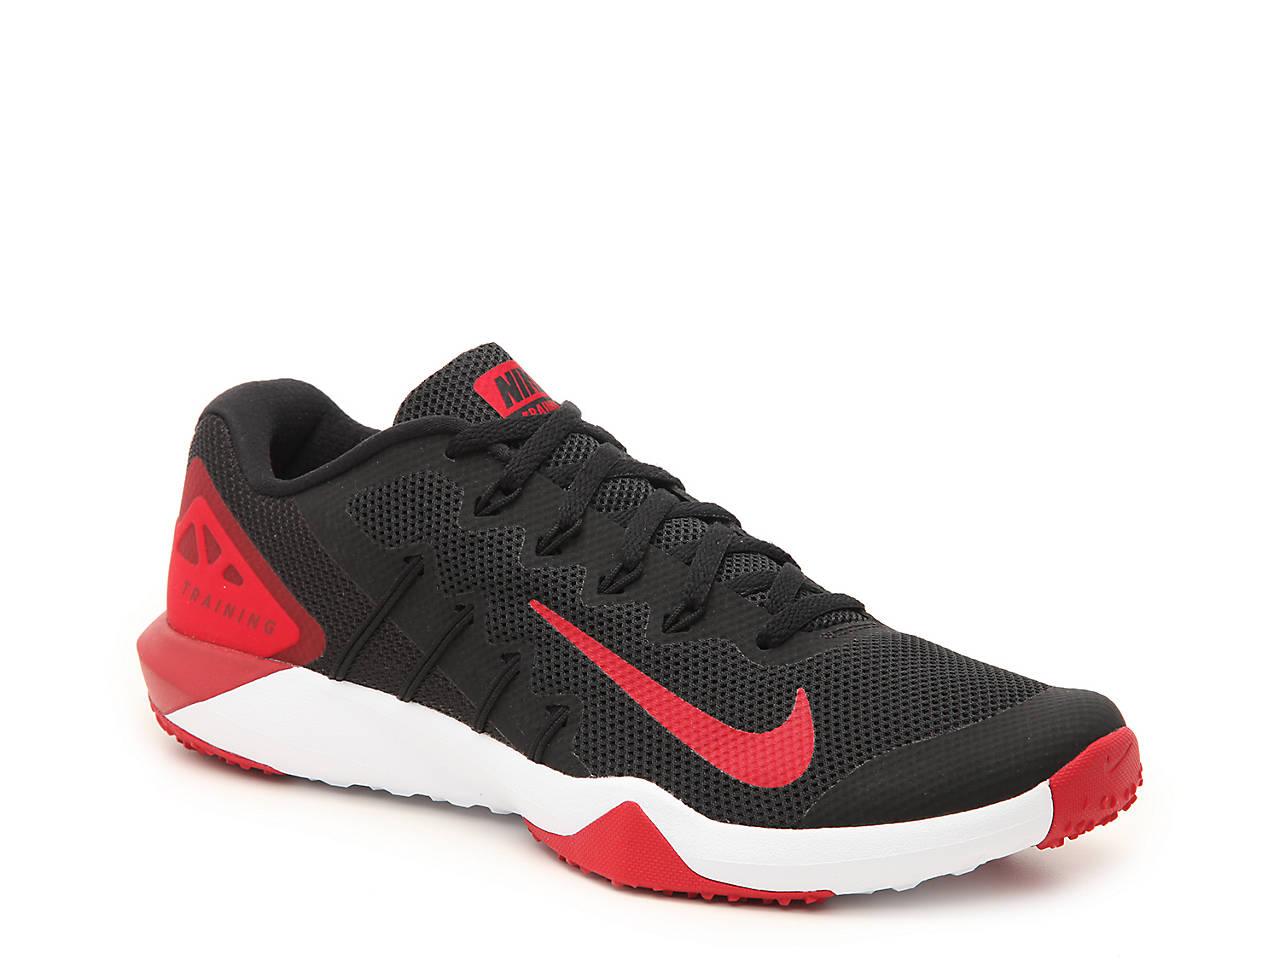 755575cca9660 Nike Retaliation 2 Performance Training Shoe - Men s Men s Shoes